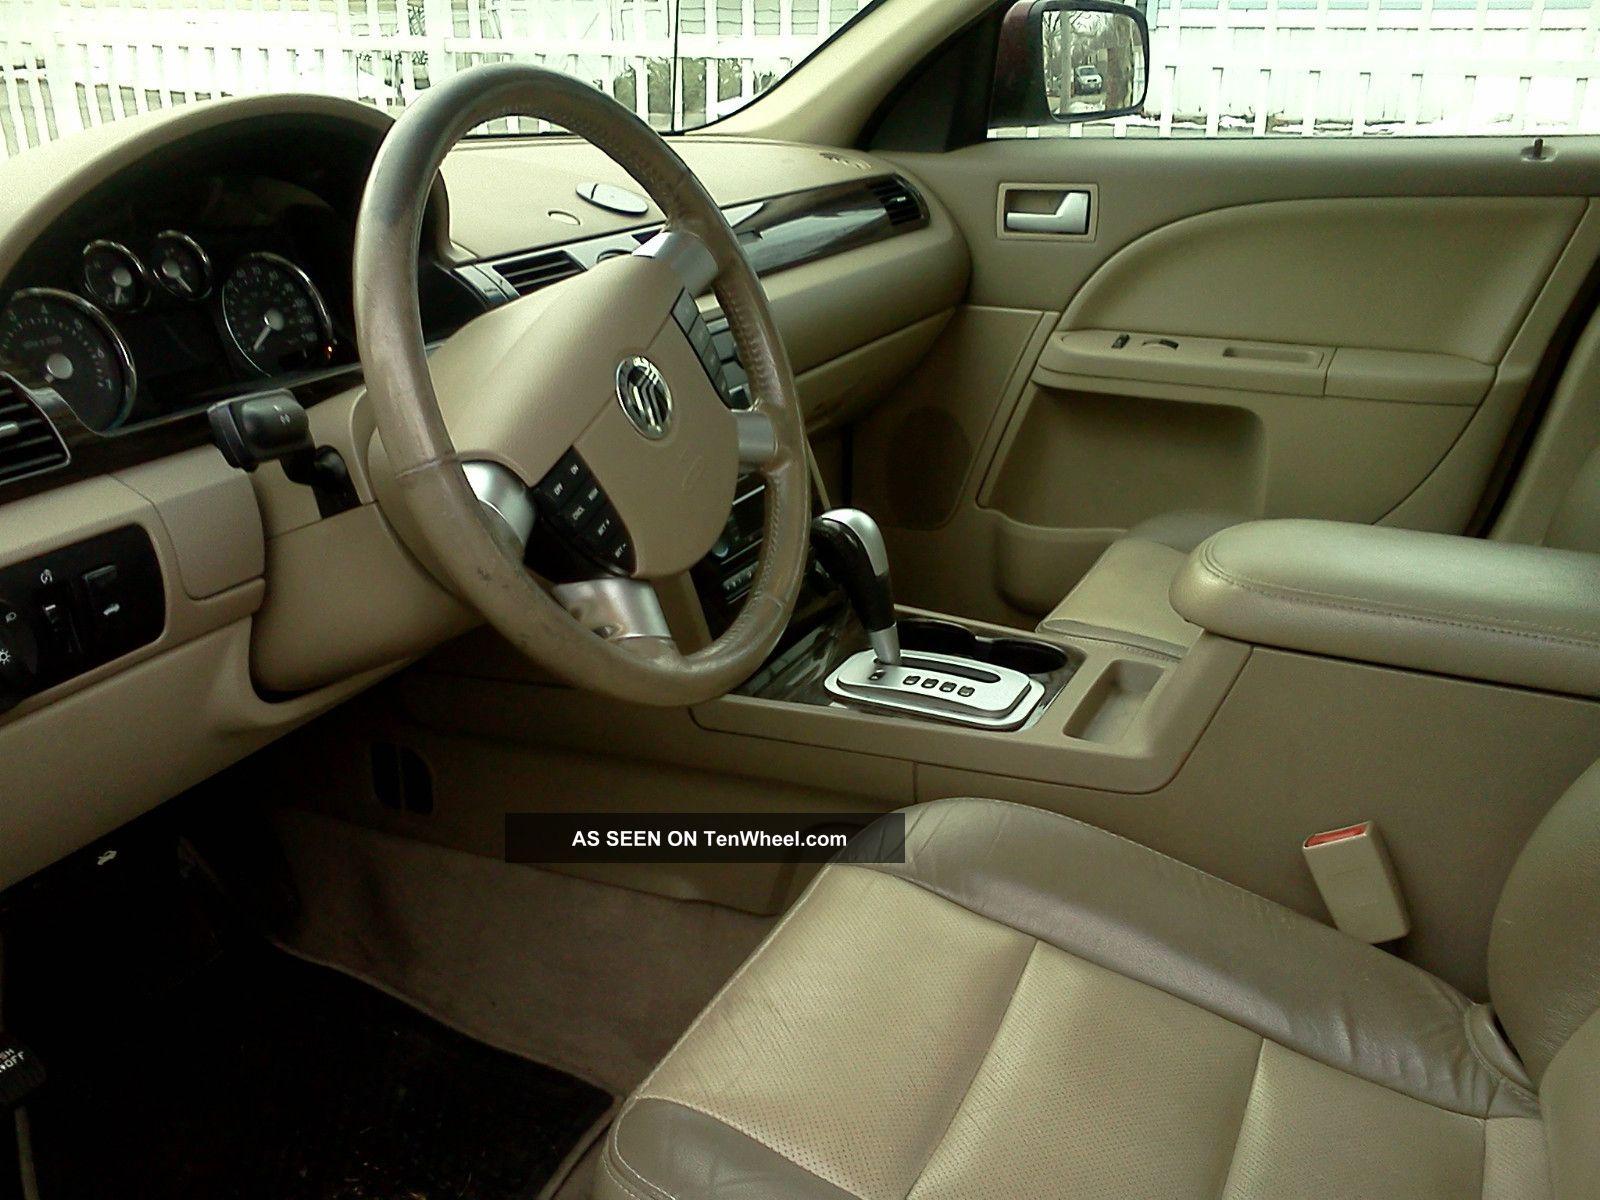 2006 Mercury Montego Luxury Sedan 4